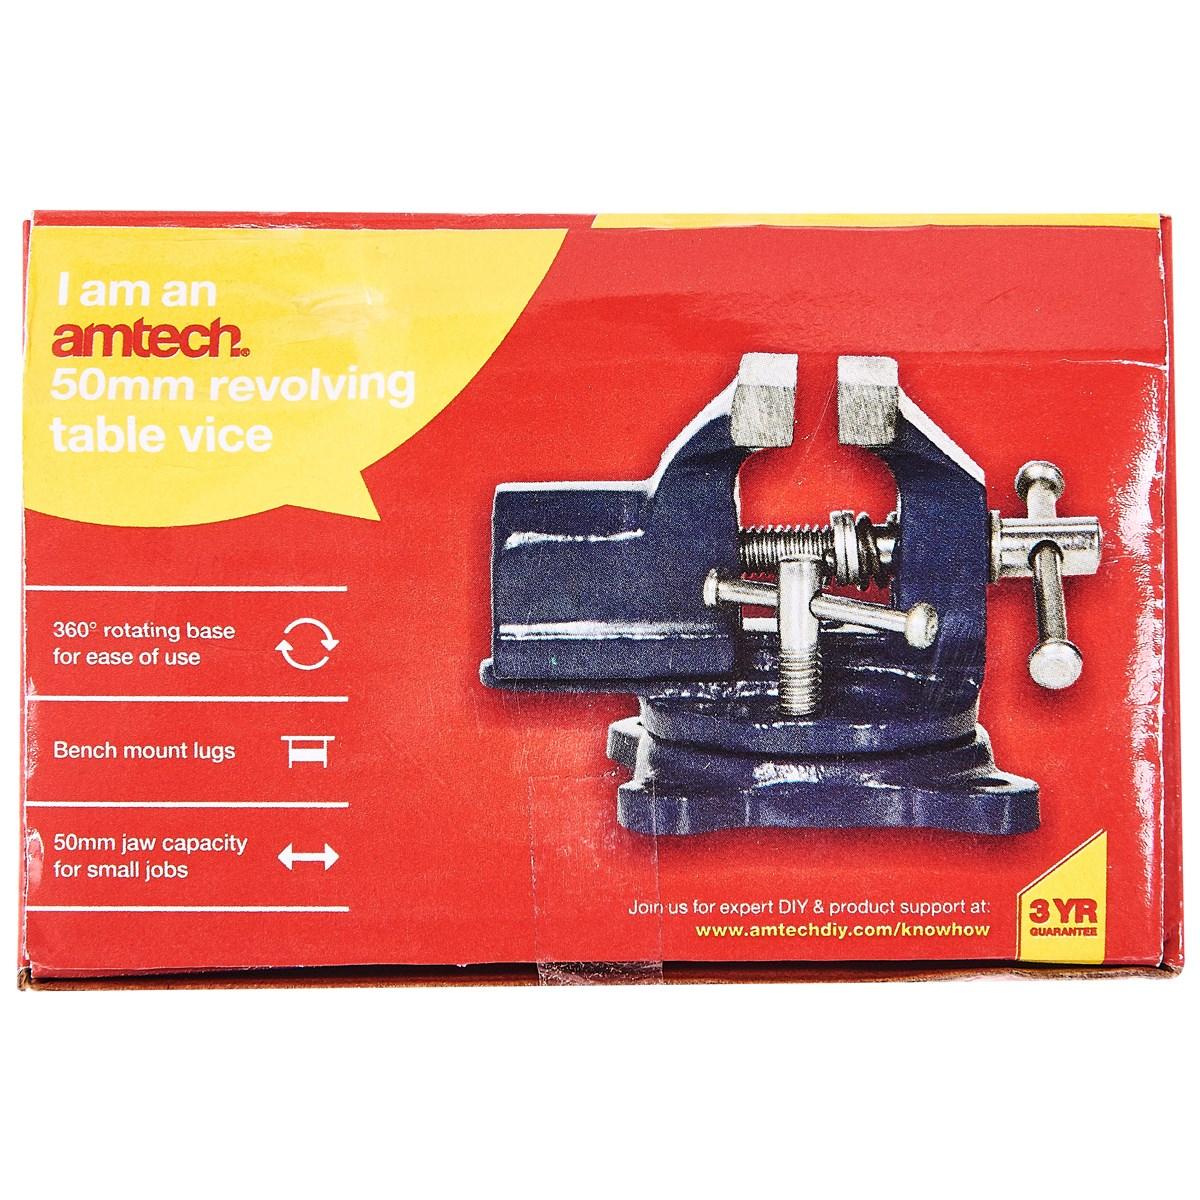 50mm revolving table vice - Amtech